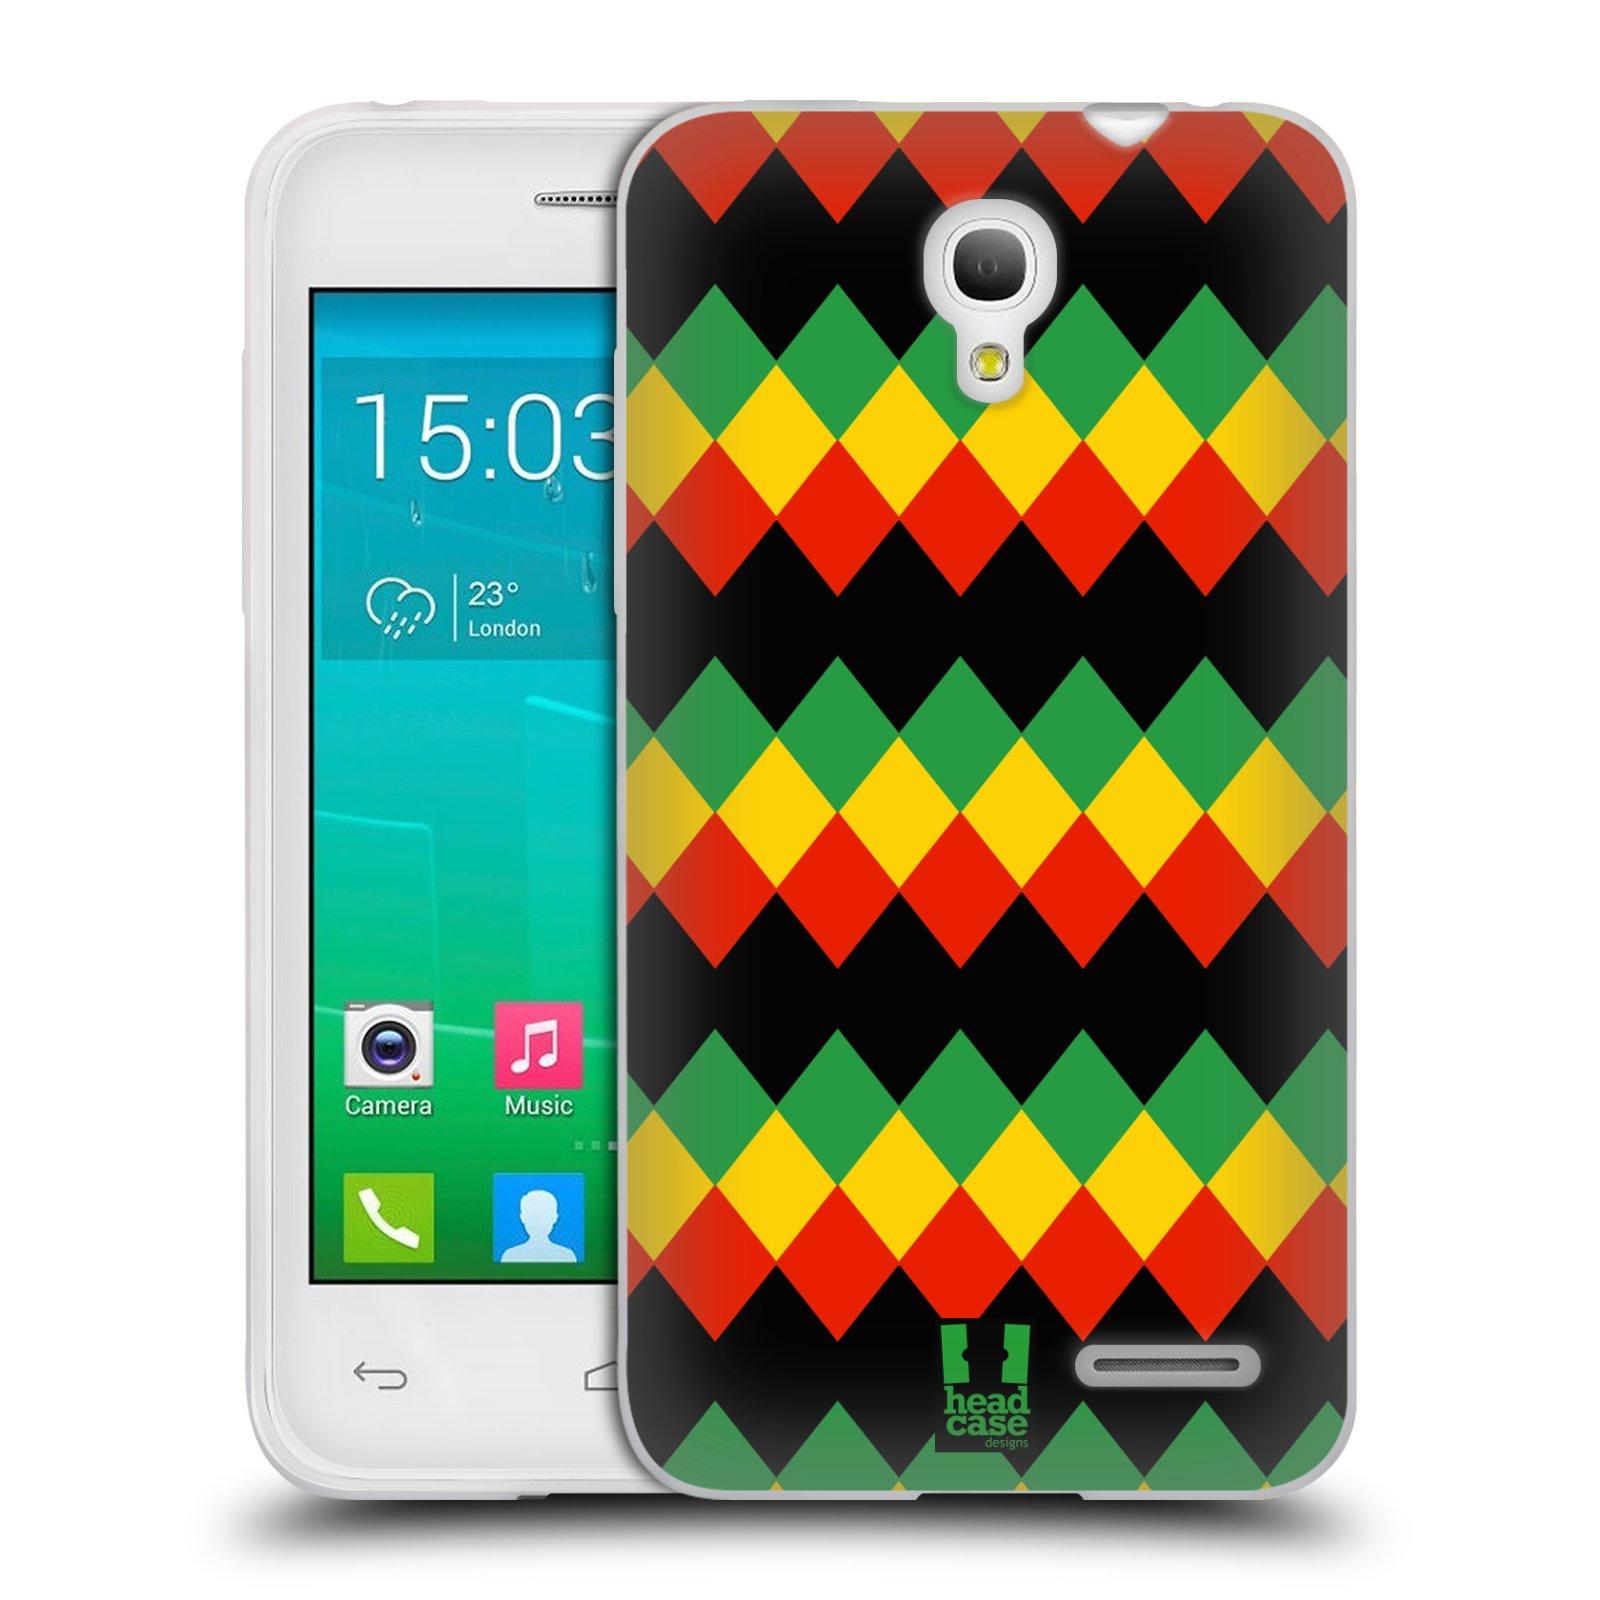 HEAD CASE silikonový obal na mobil Alcatel POP S3 OT-5050Y vzor Rasta barevné vzory DIAMANT